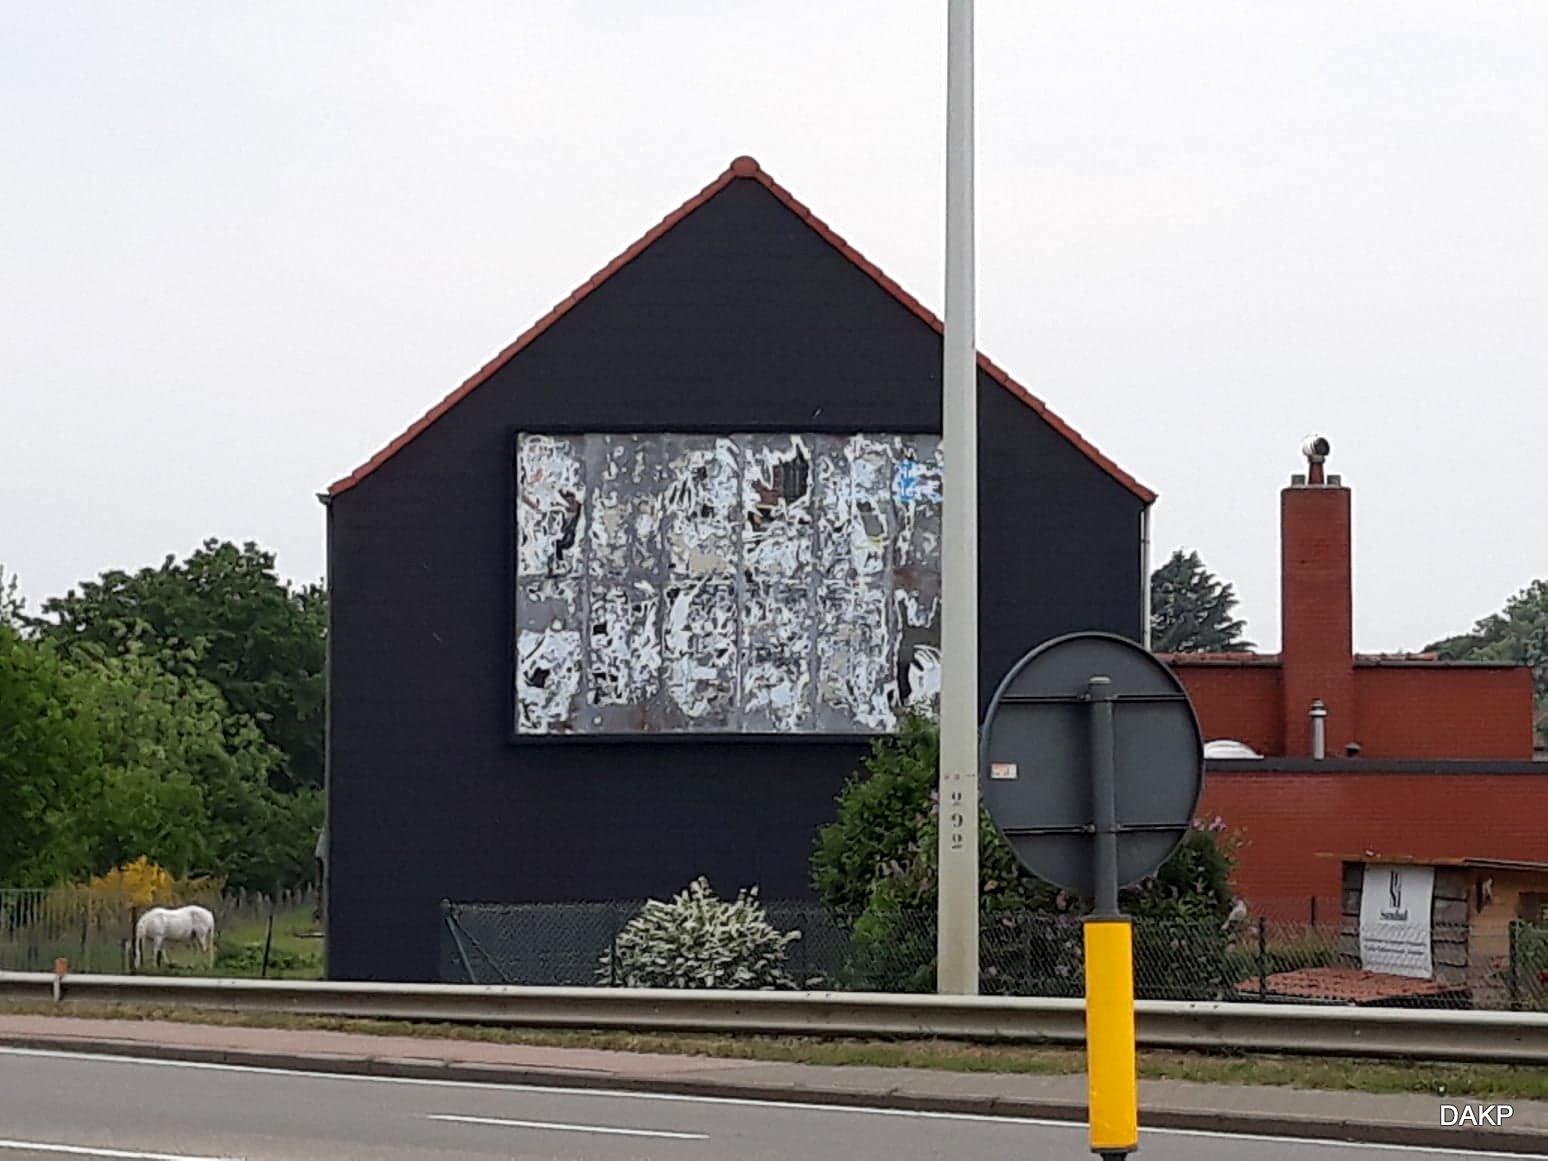 Pollocklangsdering